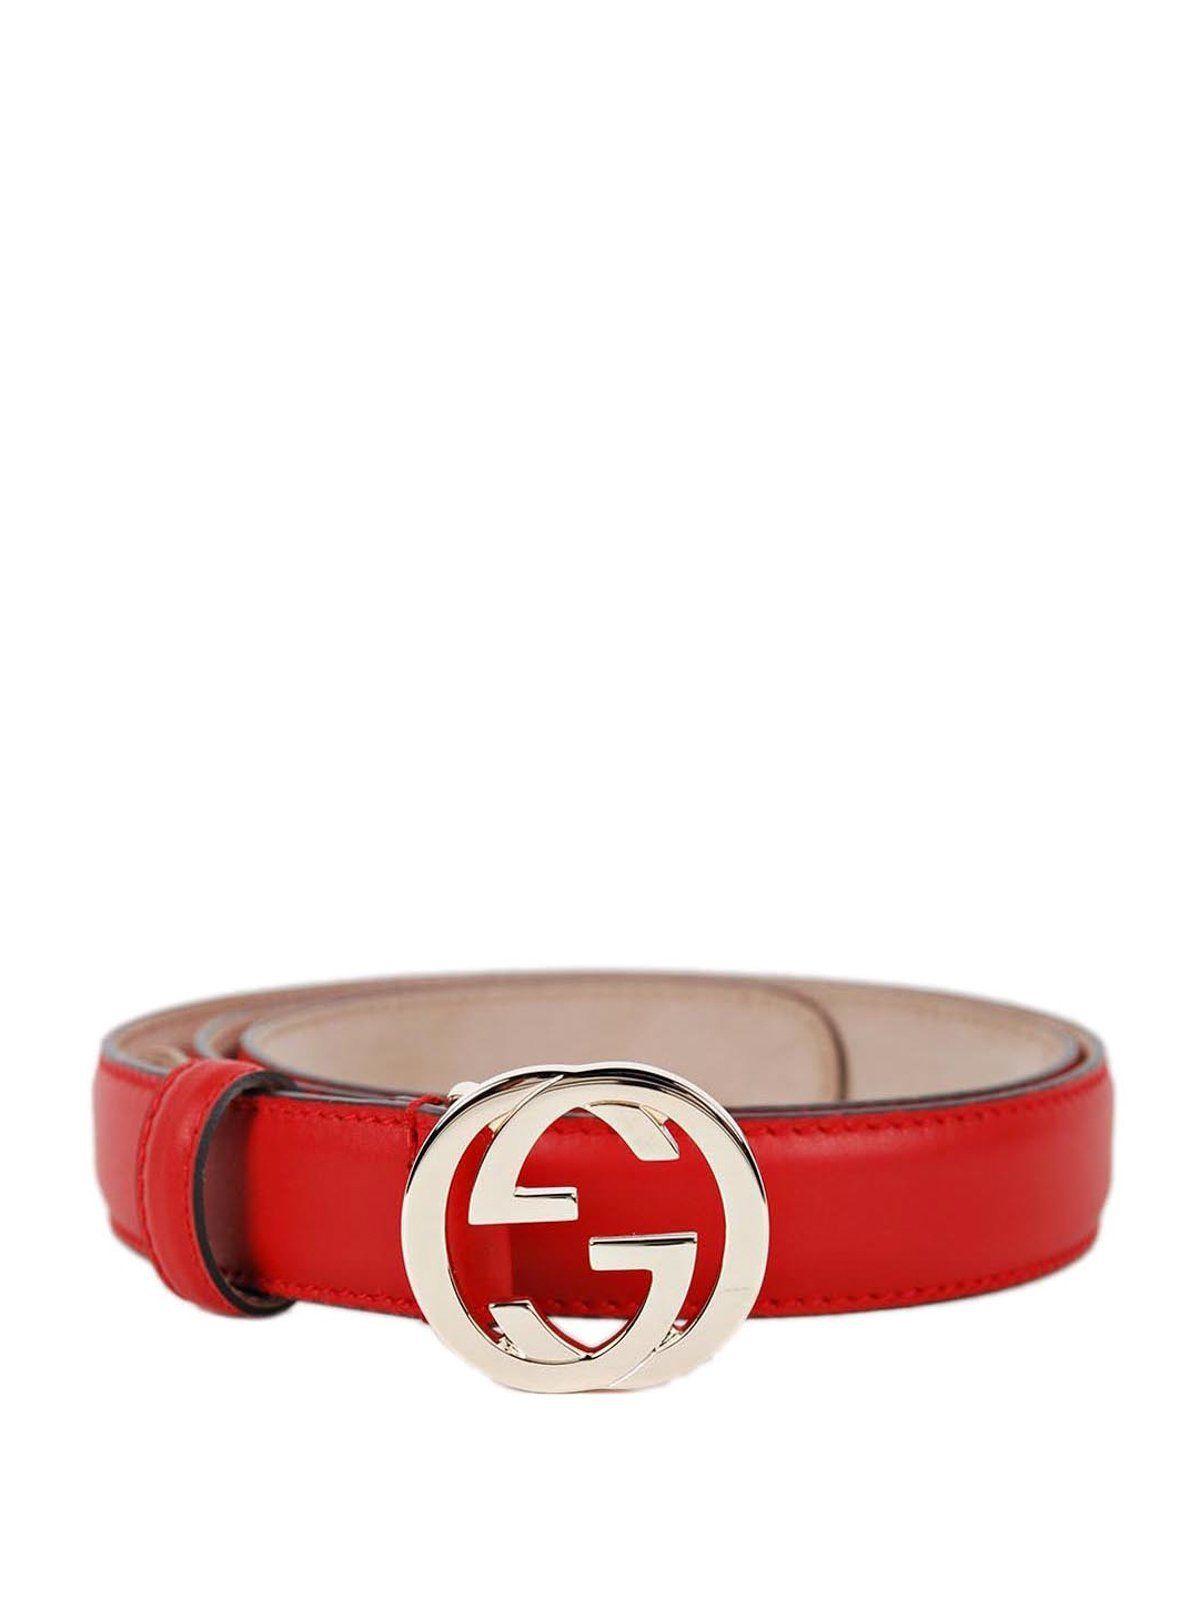 b5ba6253393b2 Gucci Red Leather Belt with Interlocking G Buckle 370717